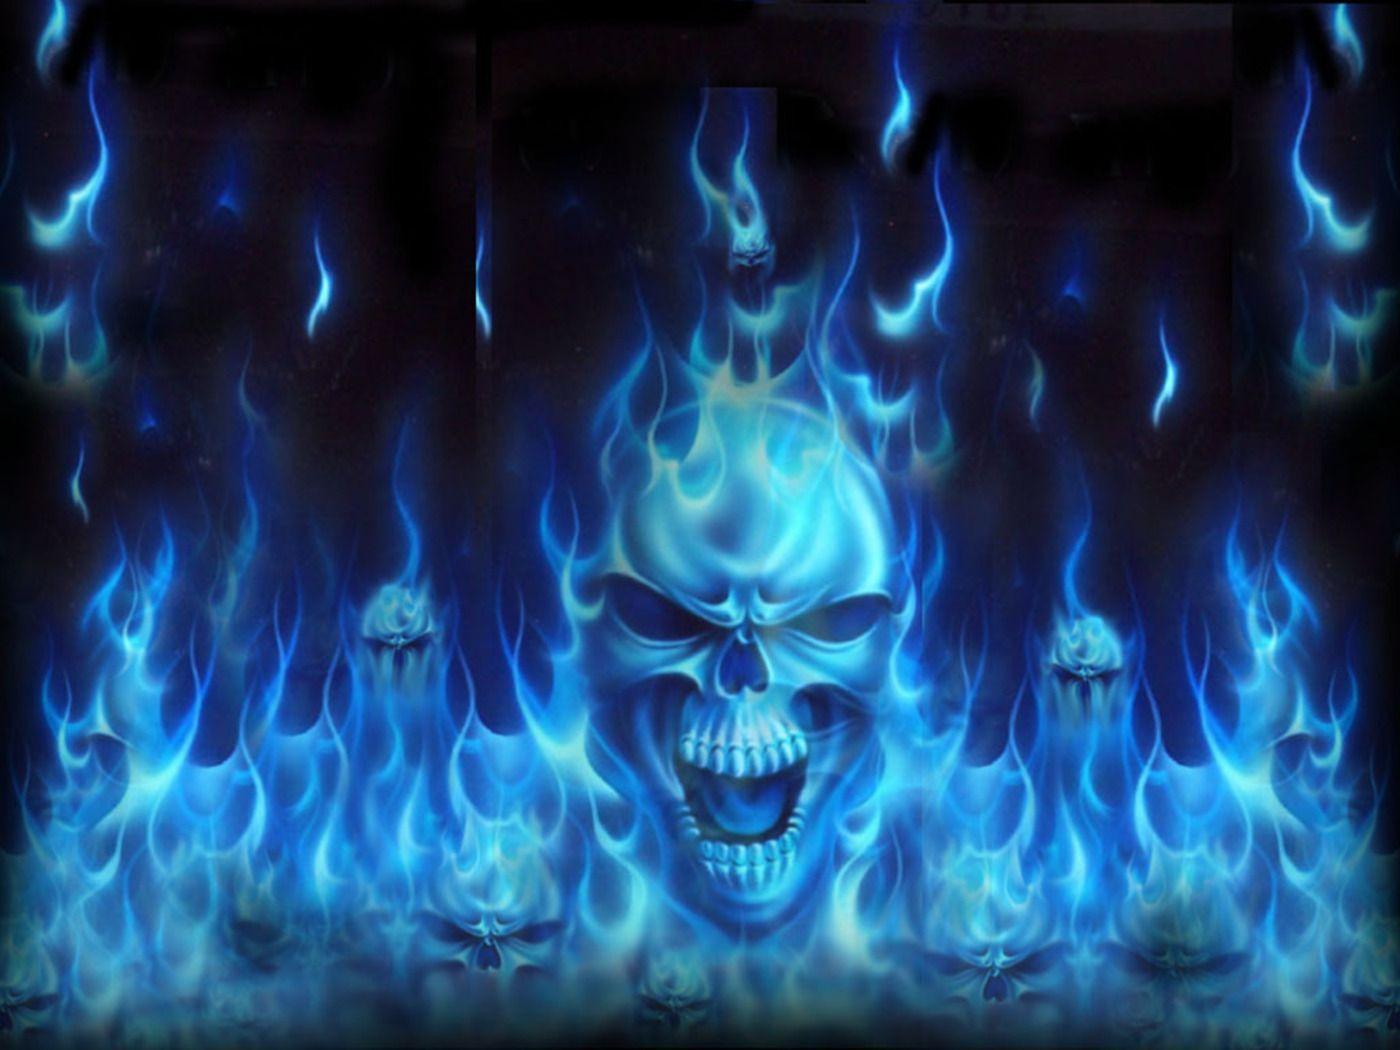 Blue Fire - Blue Skull Background , HD Wallpaper & Backgrounds